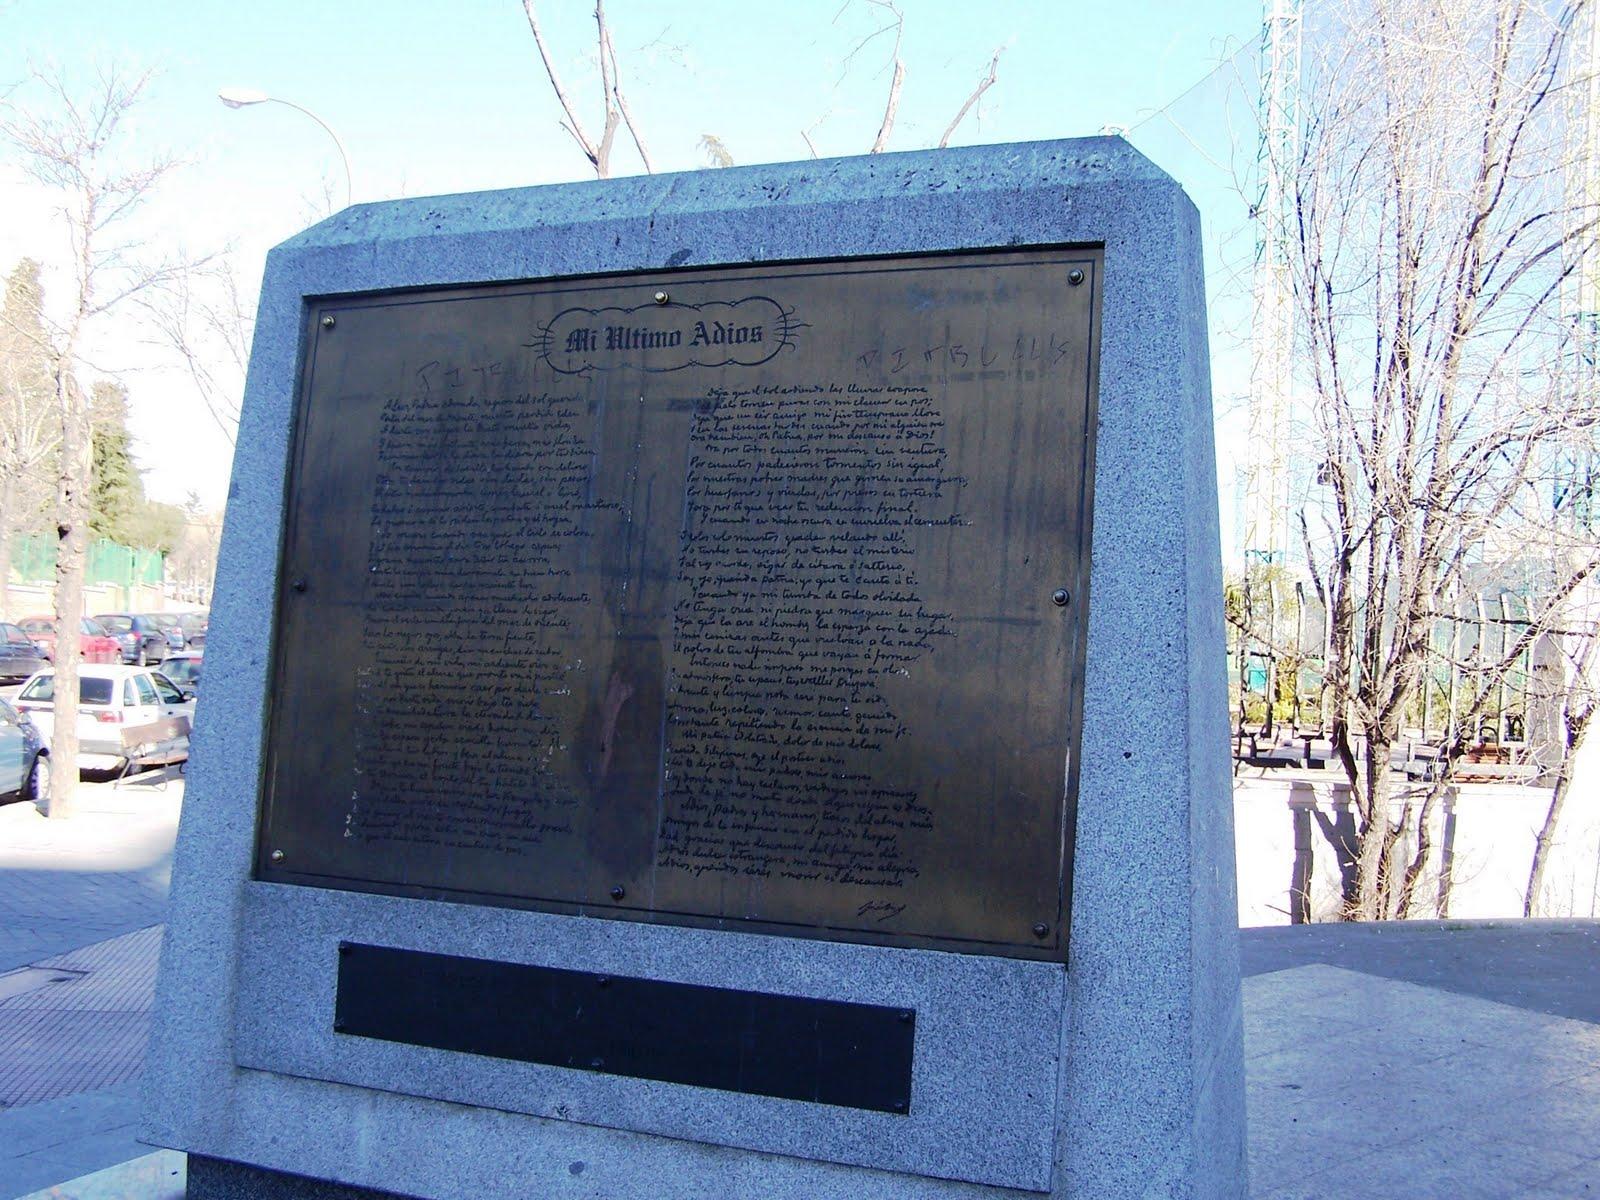 Jose Rizal Monument, Avenida De Filipinas, Madrid, Espana